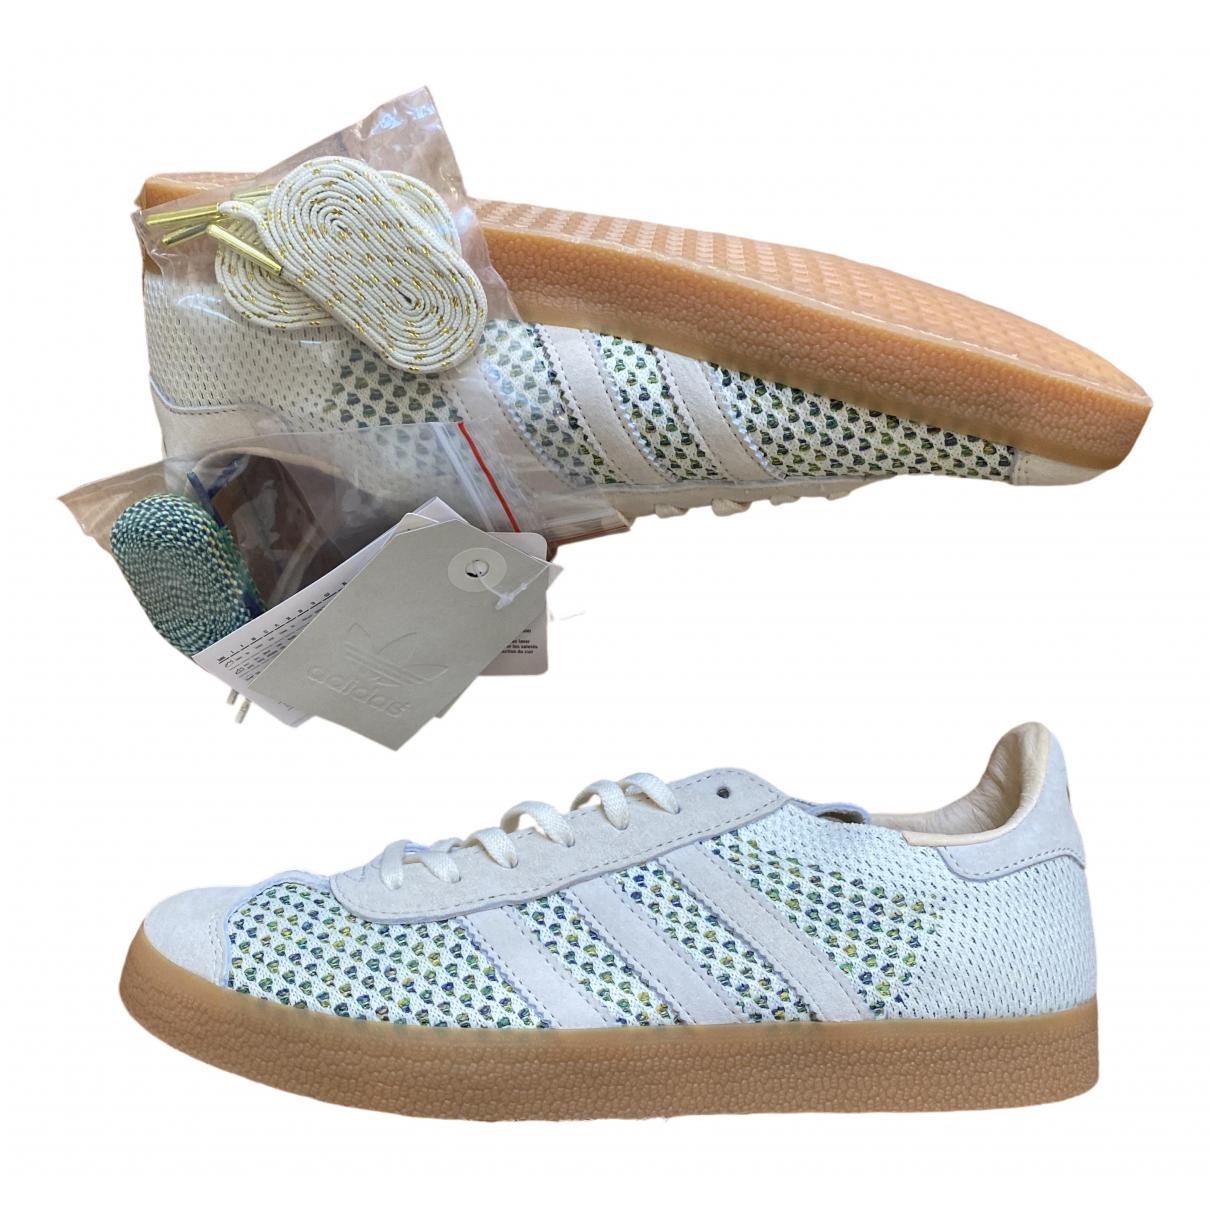 Adidas - Baskets Gazelle pour homme en suede - ecru